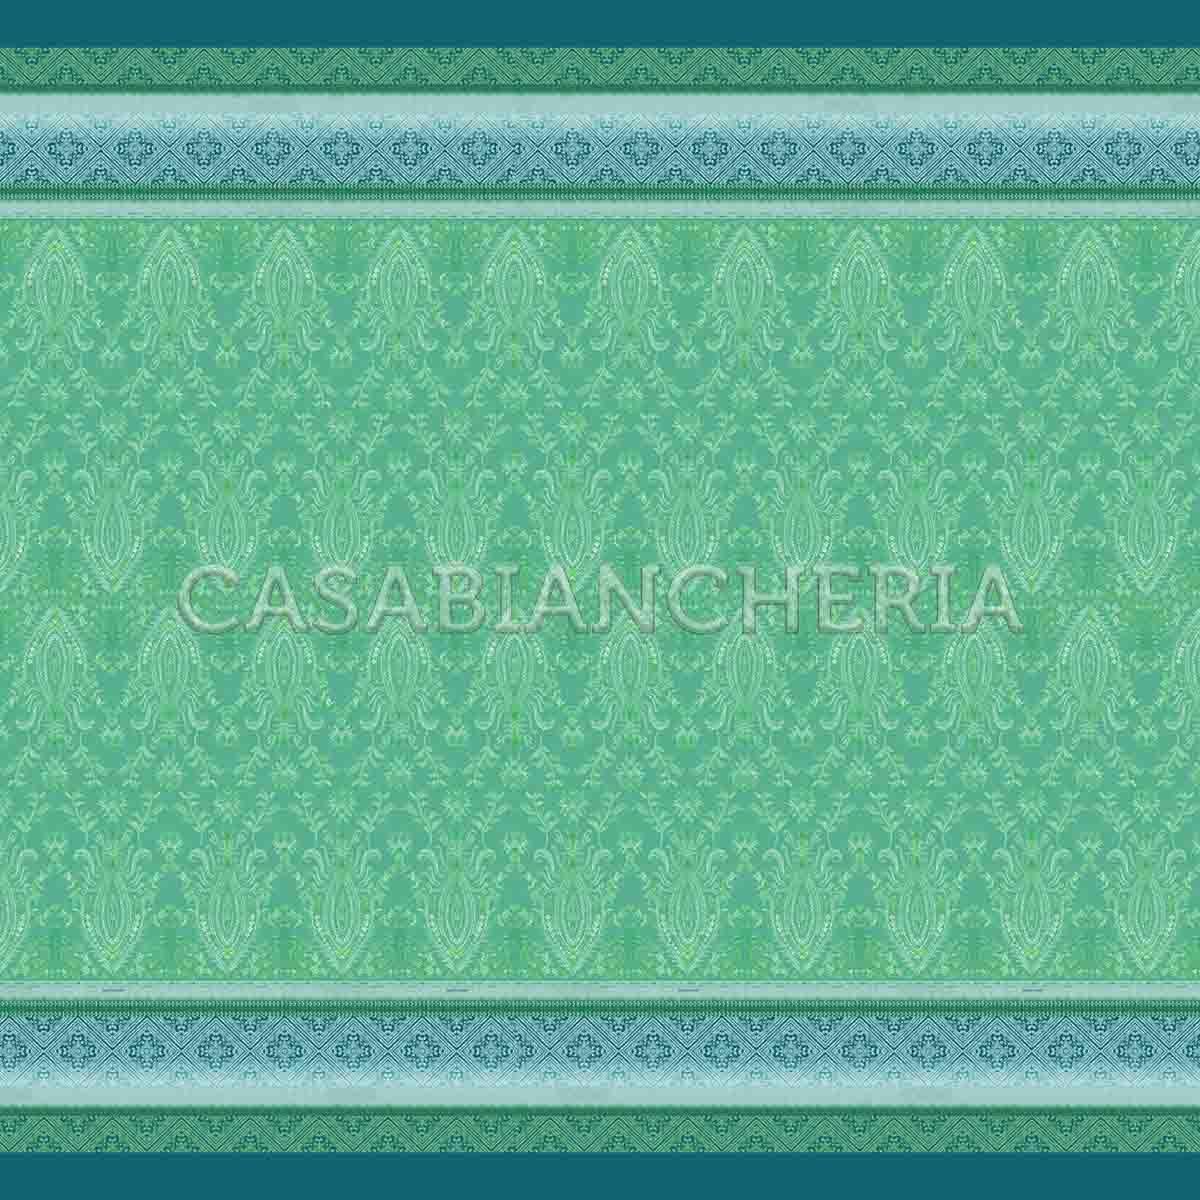 Bassetti 350x270 bassetti granfoulard telo arredo faraglioni var.2 verde 4 misure